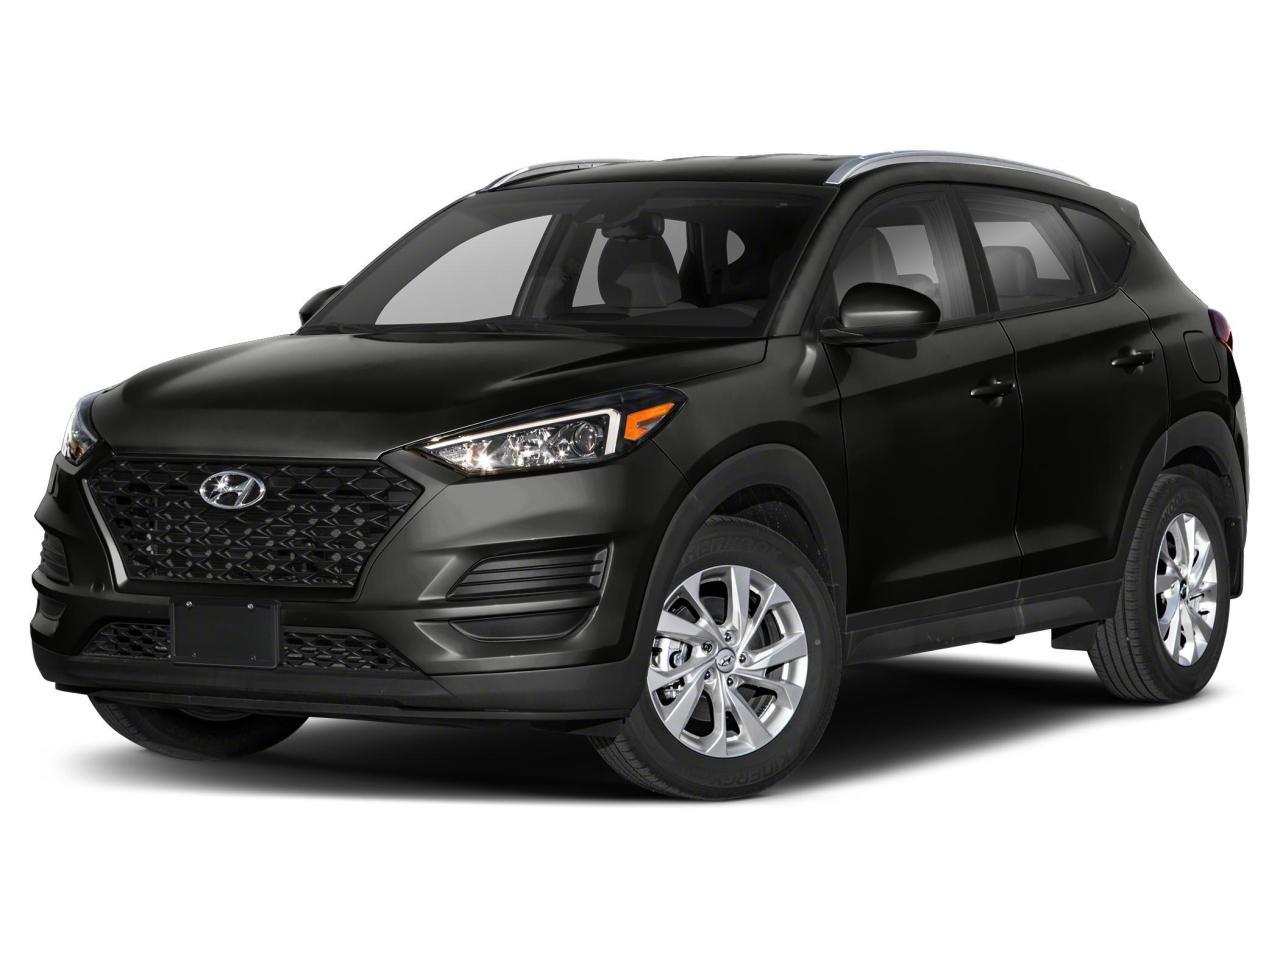 2021 Hyundai Tucson 2.0L FWD ESSENTIAL NO OPTIONS